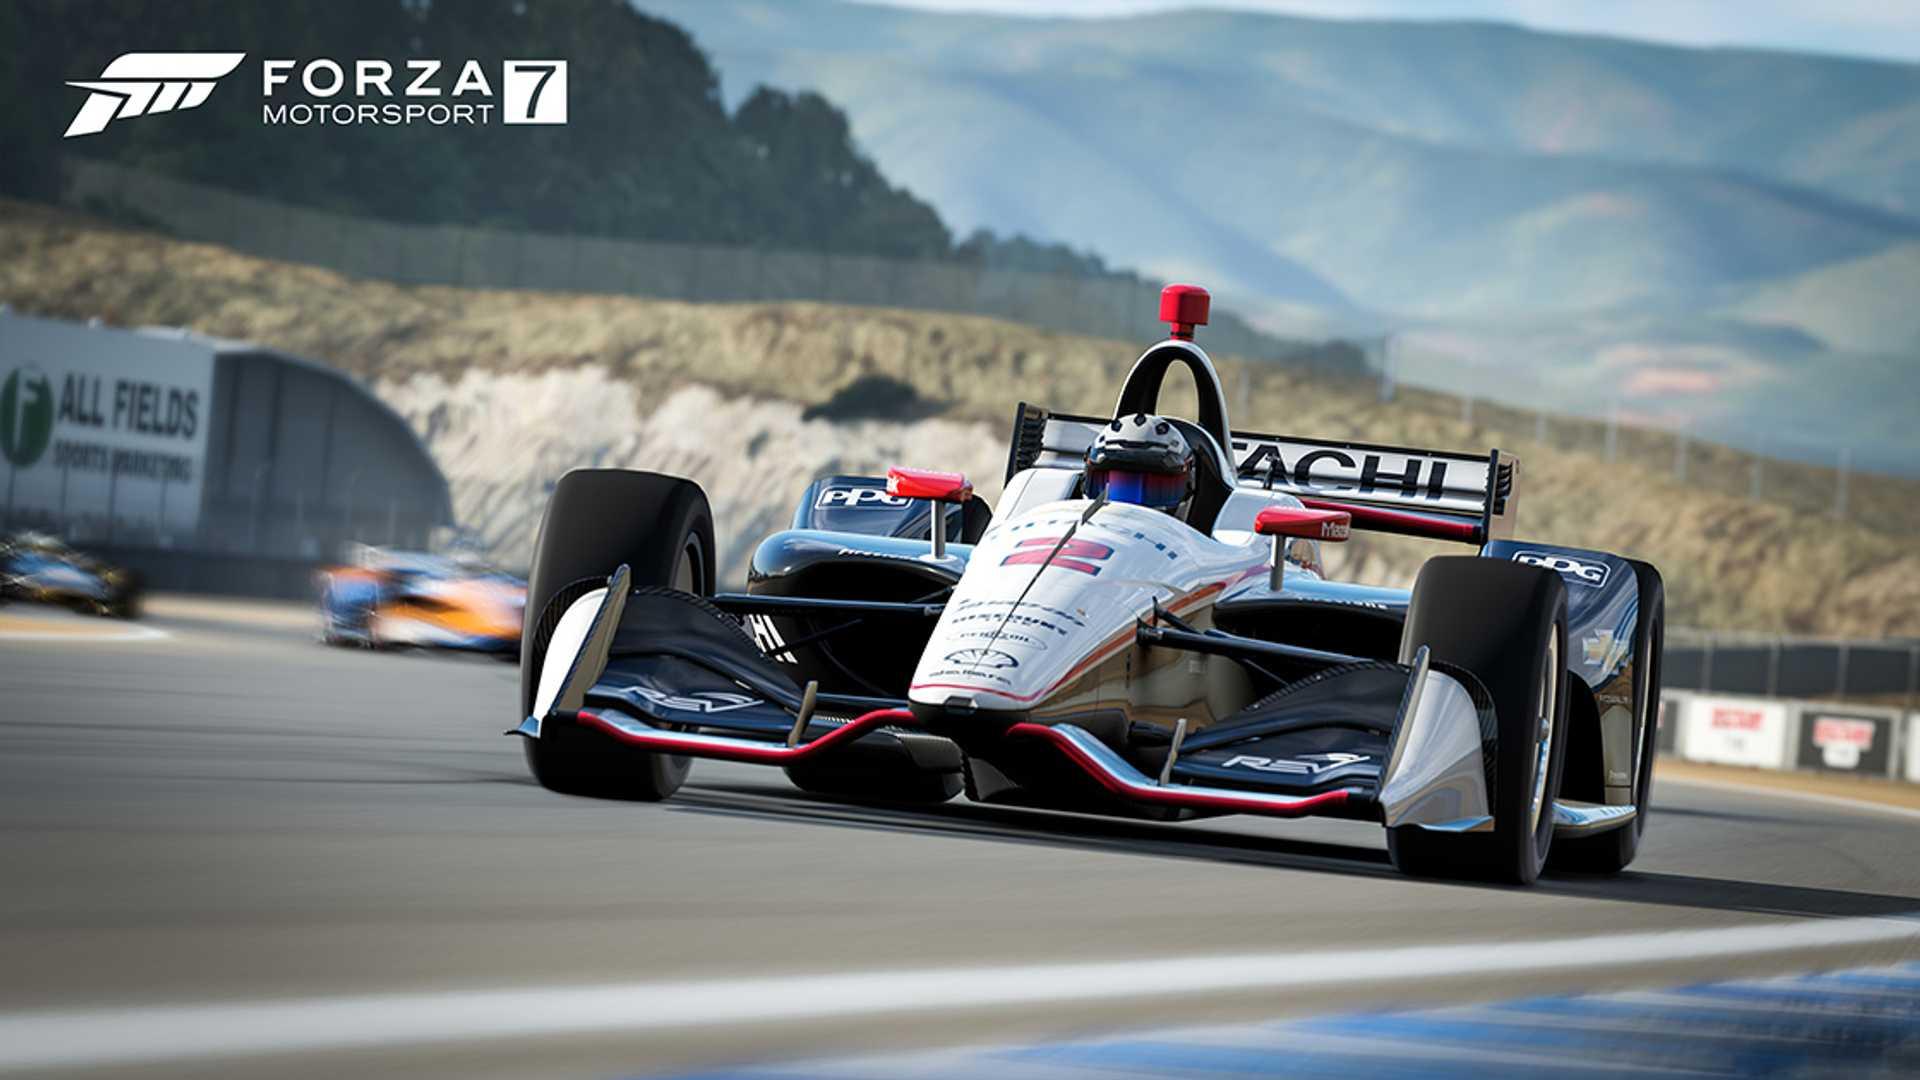 forza-motorsport-7-may-2019-update-2